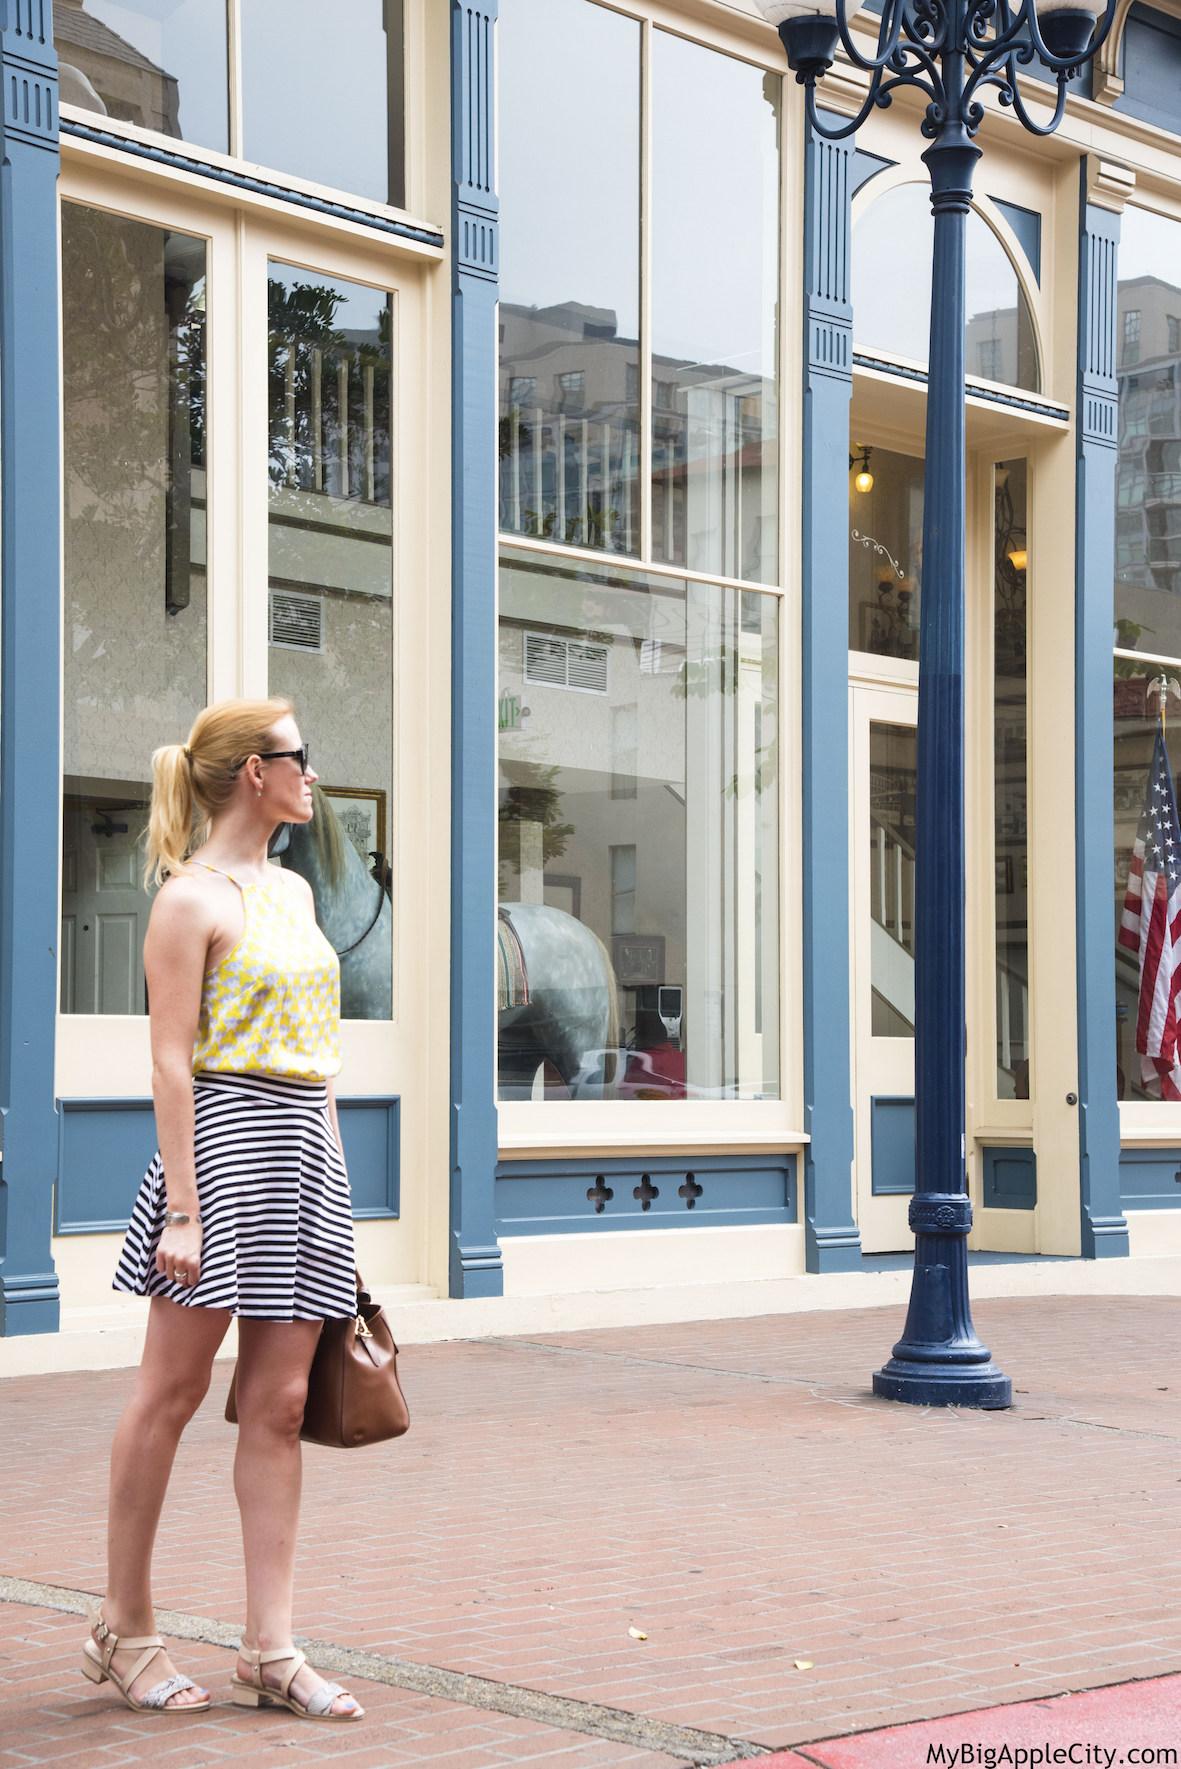 Fashion-blogger-ootd-travelblog-california-mybigapplecity